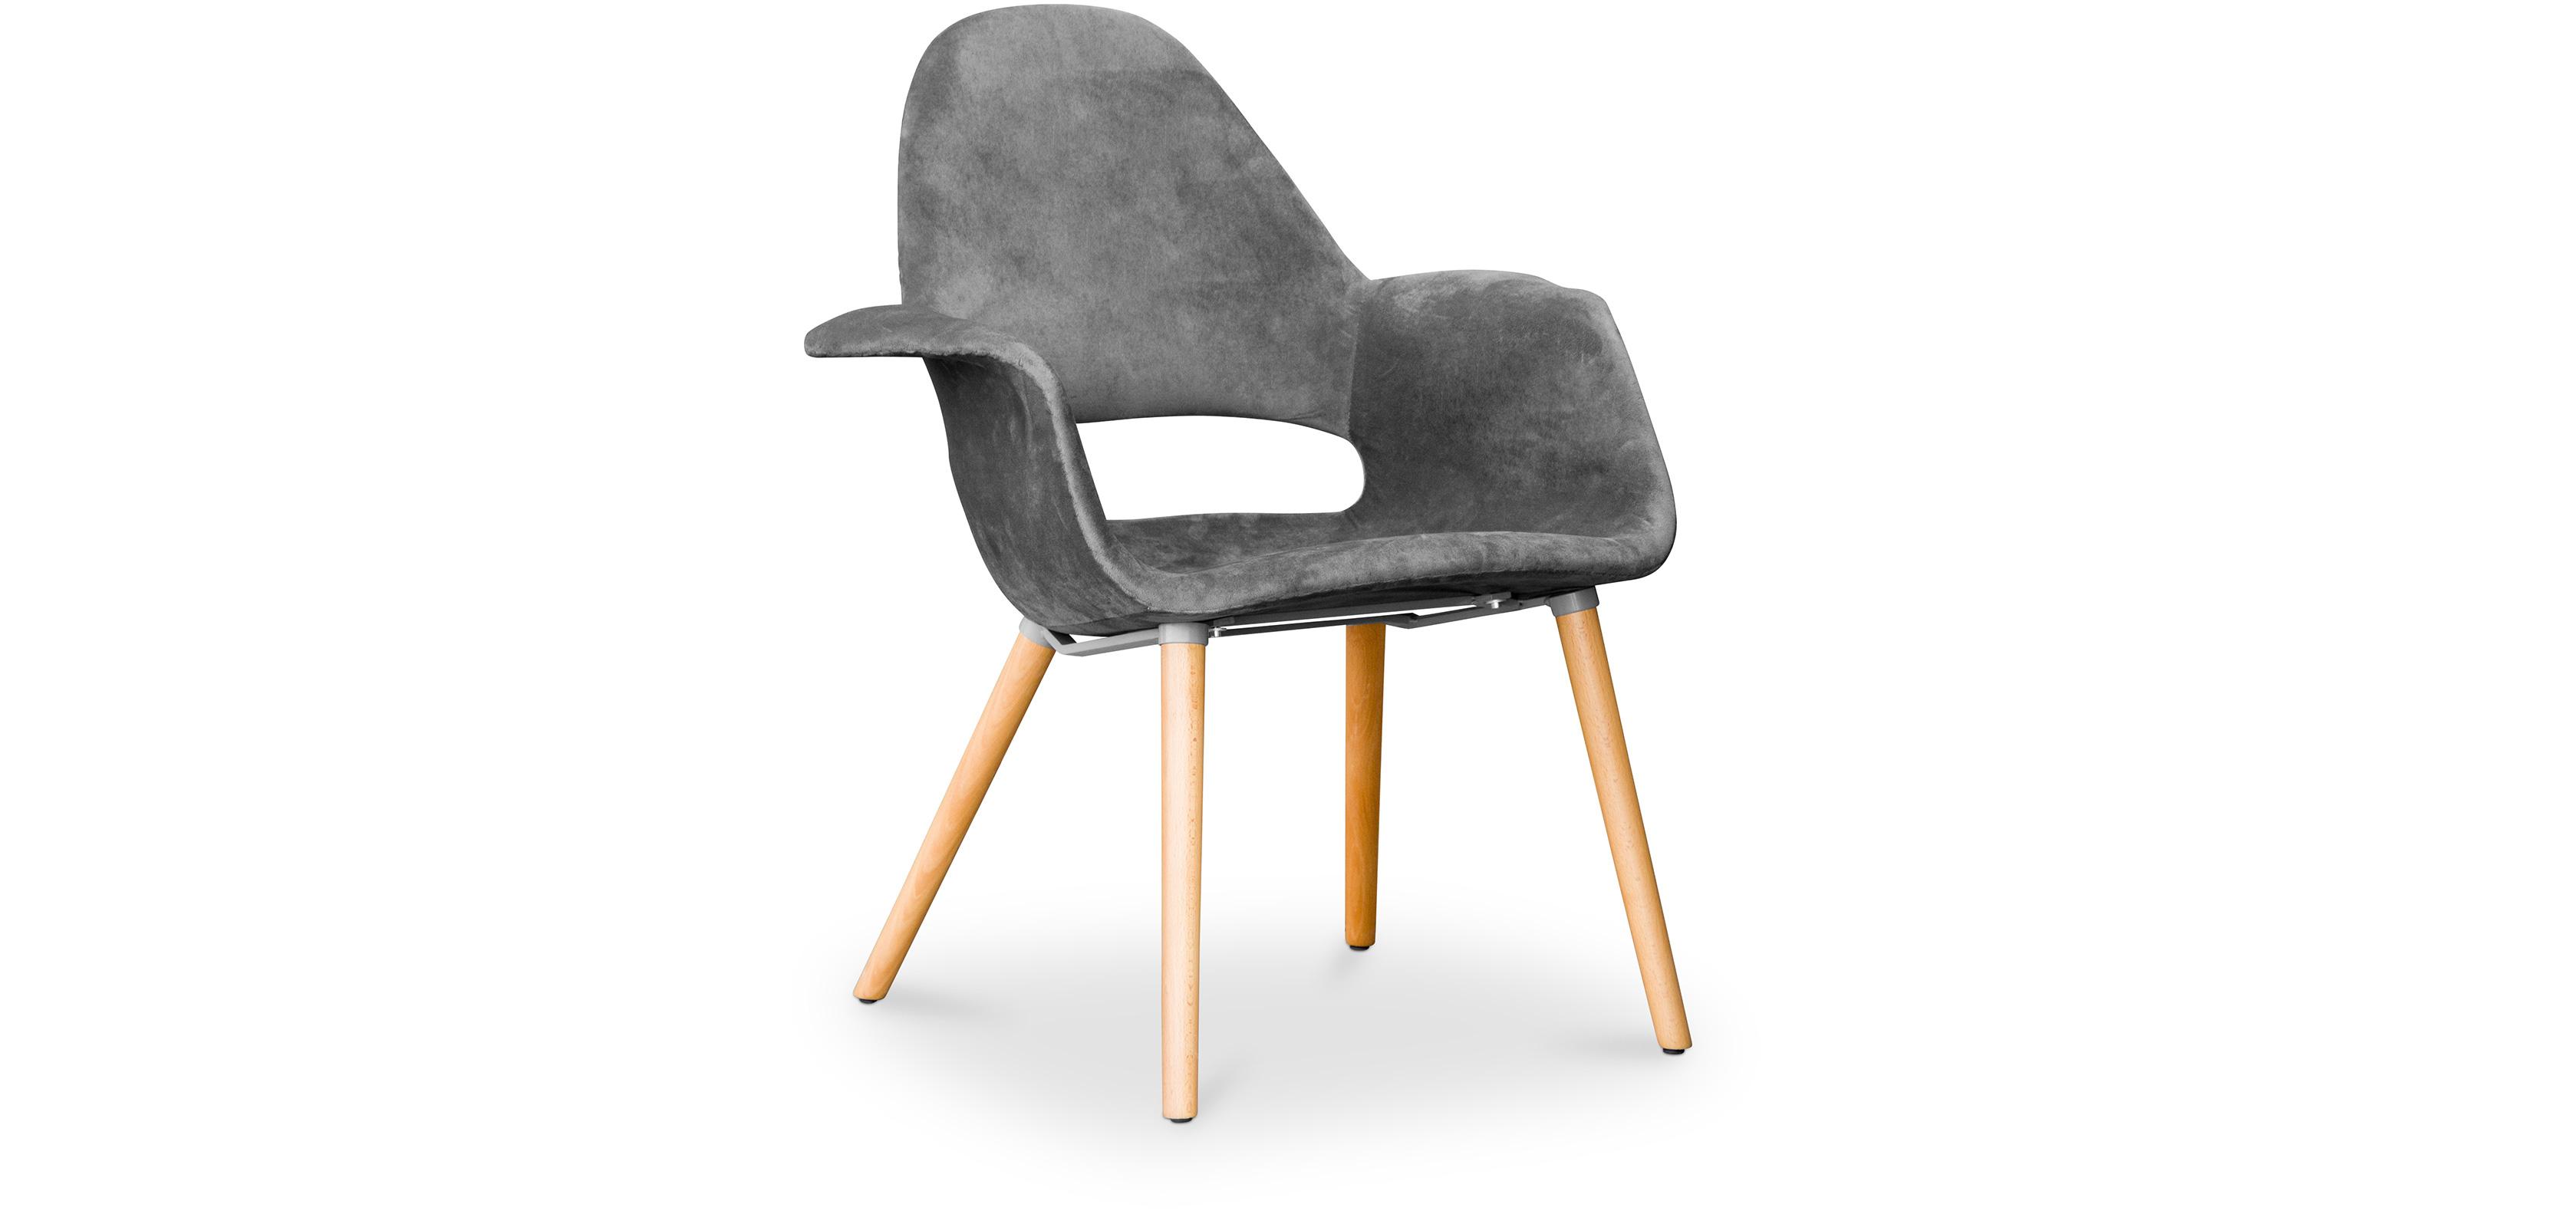 organic skandinavisches stuhl charles eames und eero saarinen style. Black Bedroom Furniture Sets. Home Design Ideas